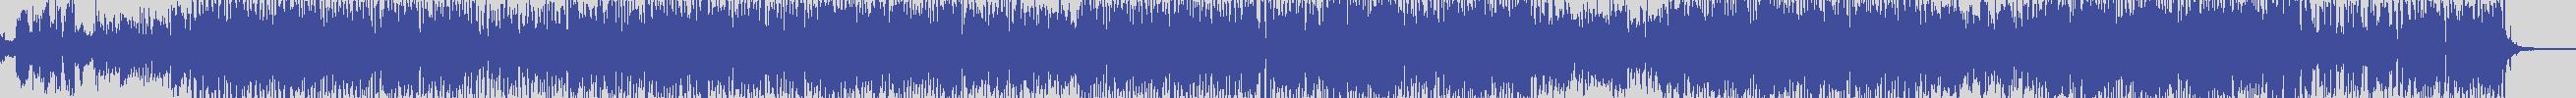 smilax_dig_records [SDR001] El Ritmo Cubano - Pa Fiesta [Original Mix] audio wave form